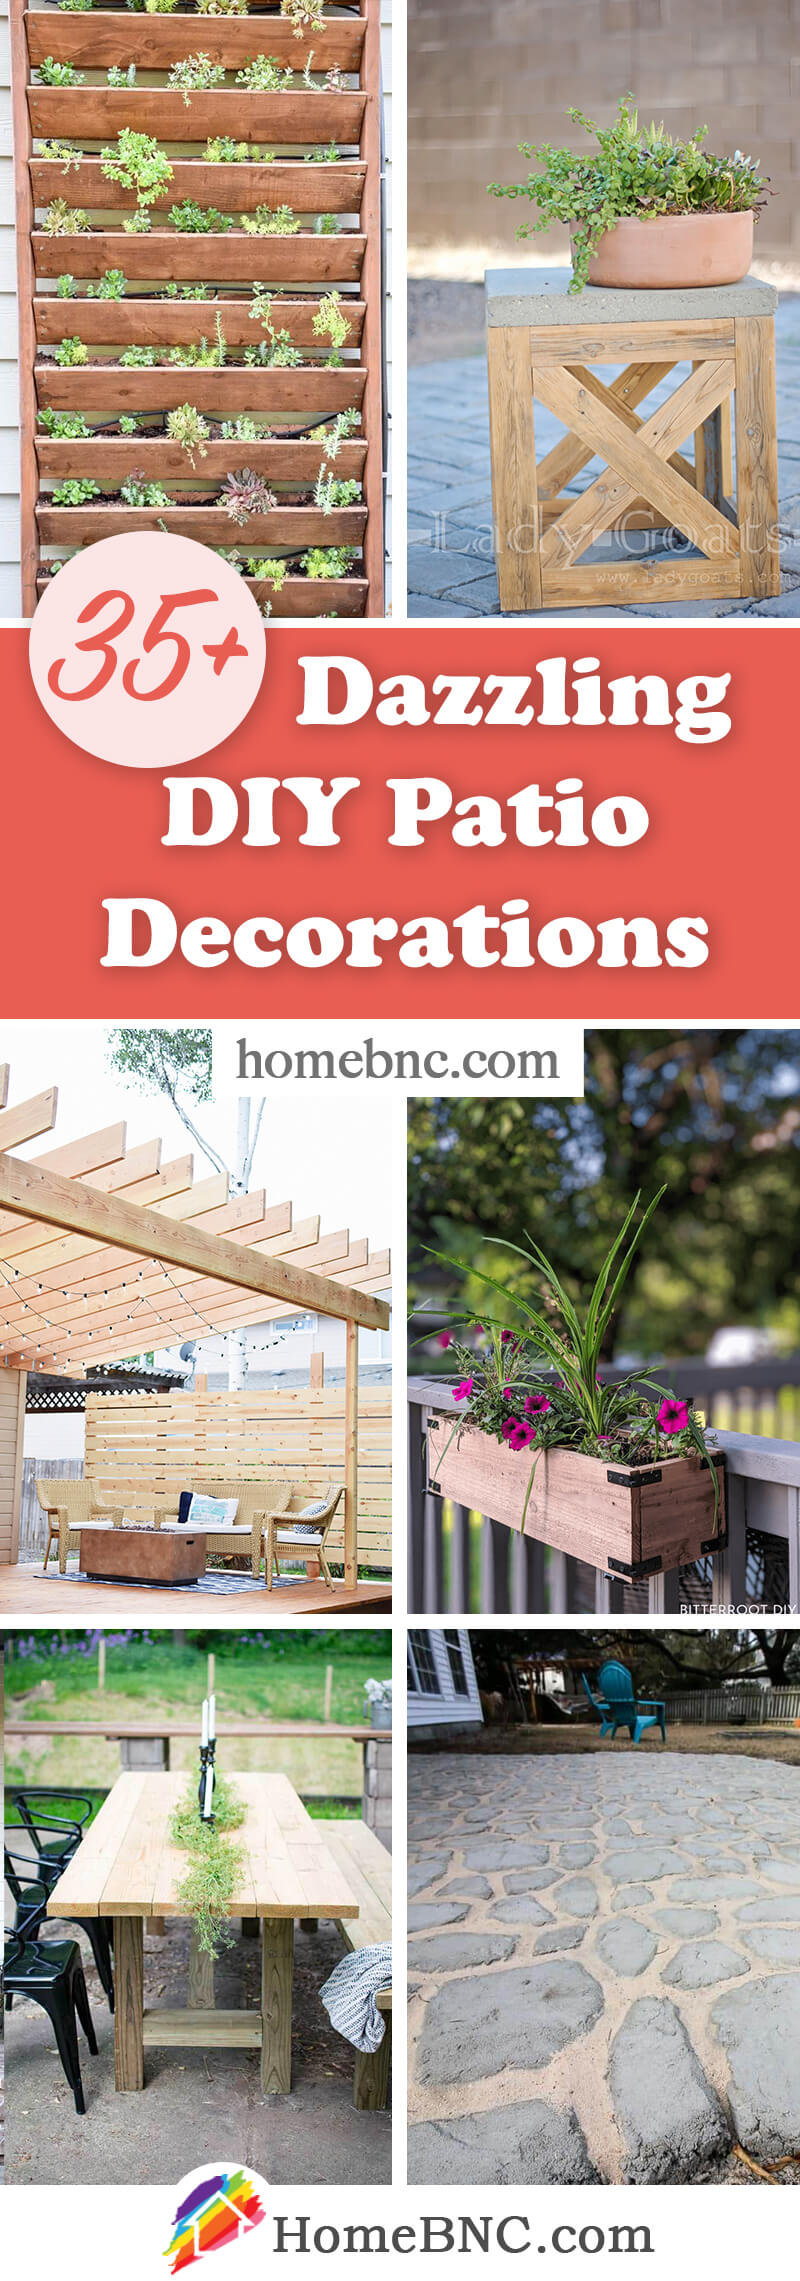 DIY Patio Decor Ideas